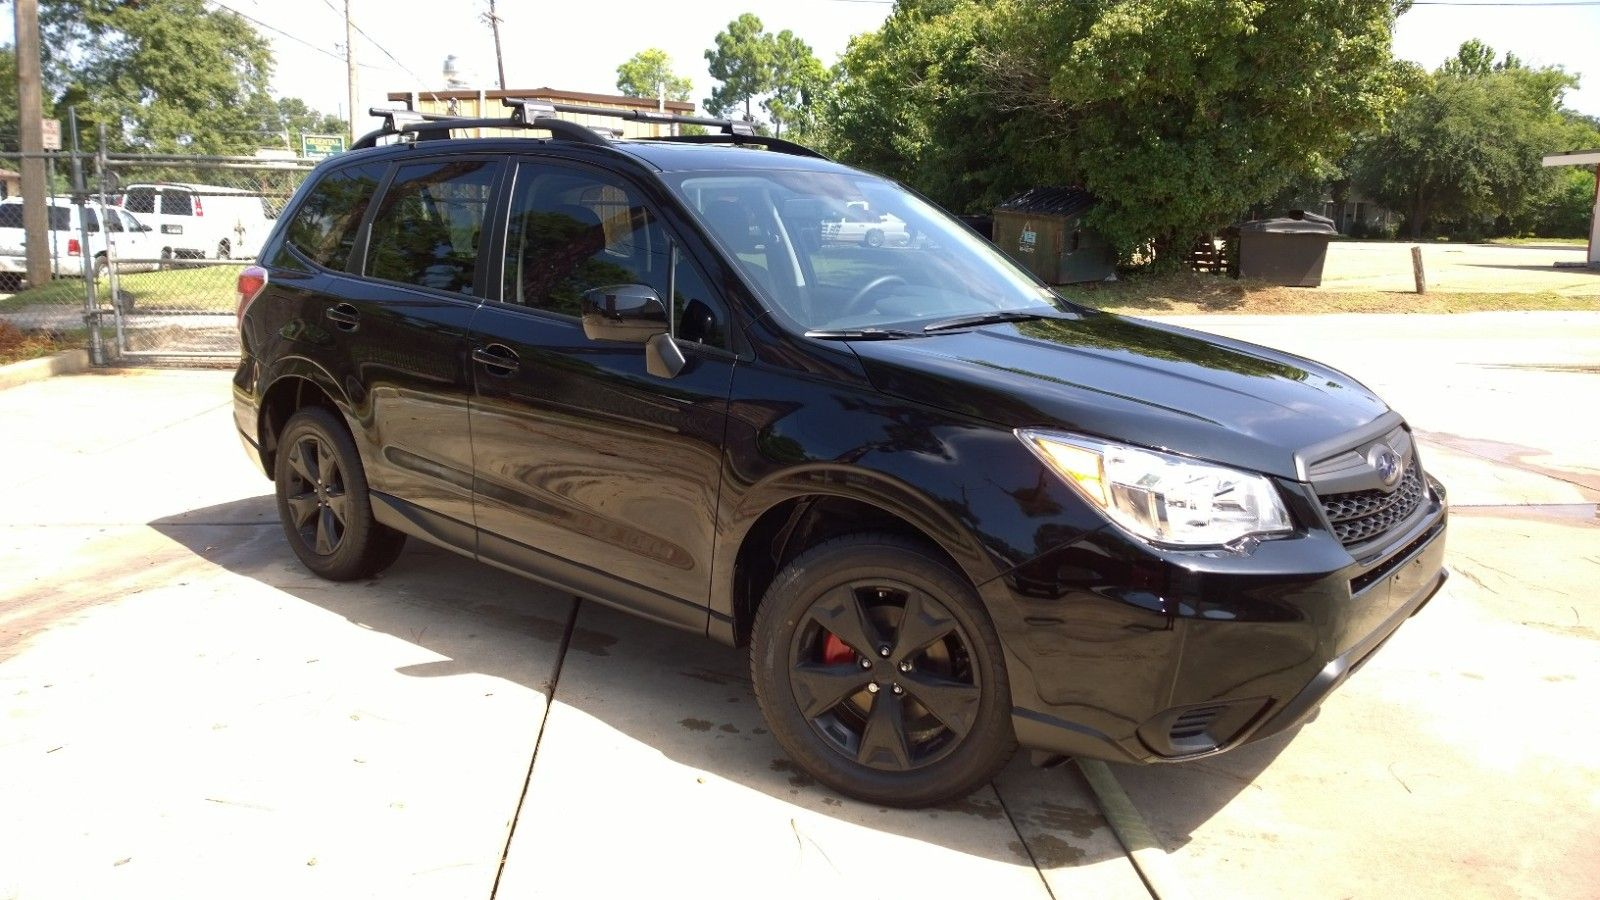 Subaru 2015 subaru forester specs : Subaru Forester 2015 Black Rims - 2015 subaru forester research ...